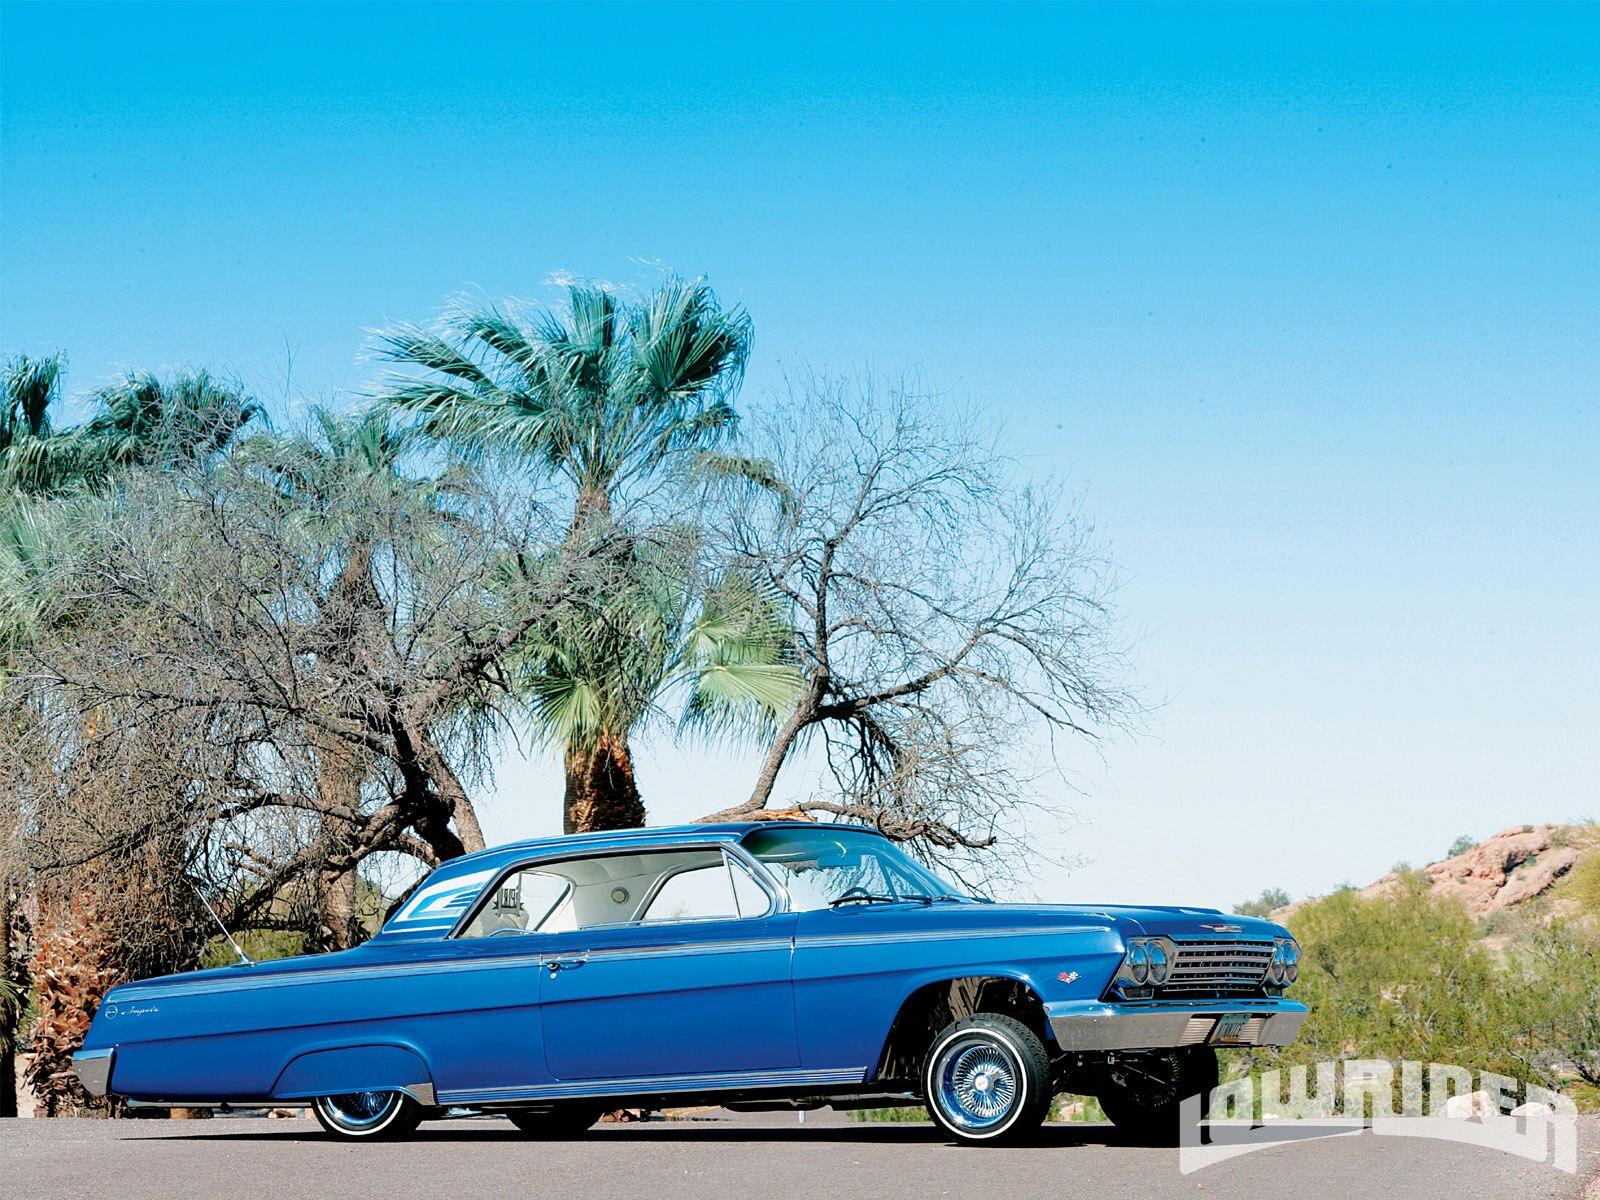 0810-lrmp-01-o-1962-chevrolet-impala-passenger-side-view1